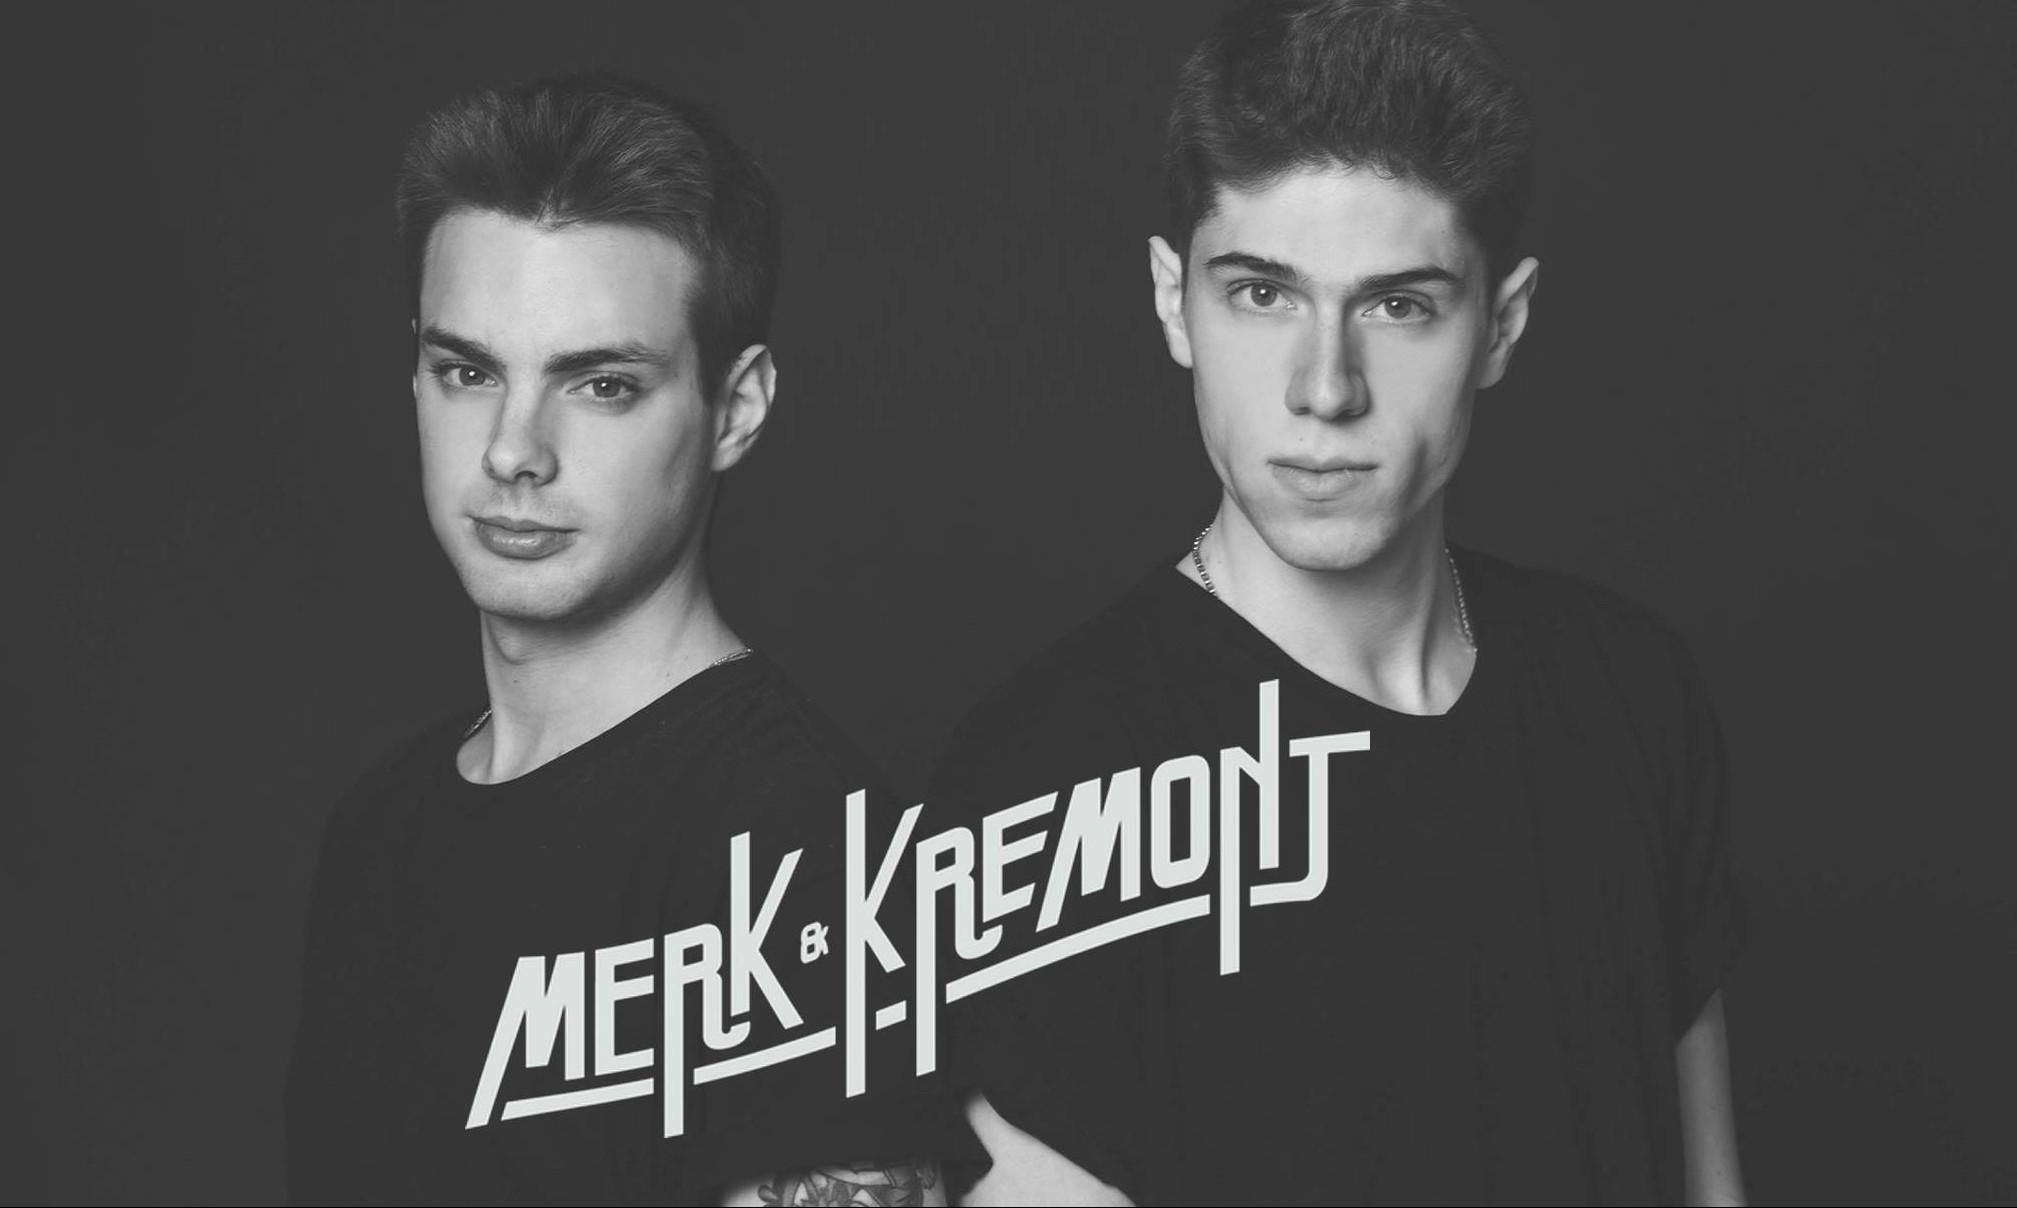 Merk & Kremont lezione in Bocconi